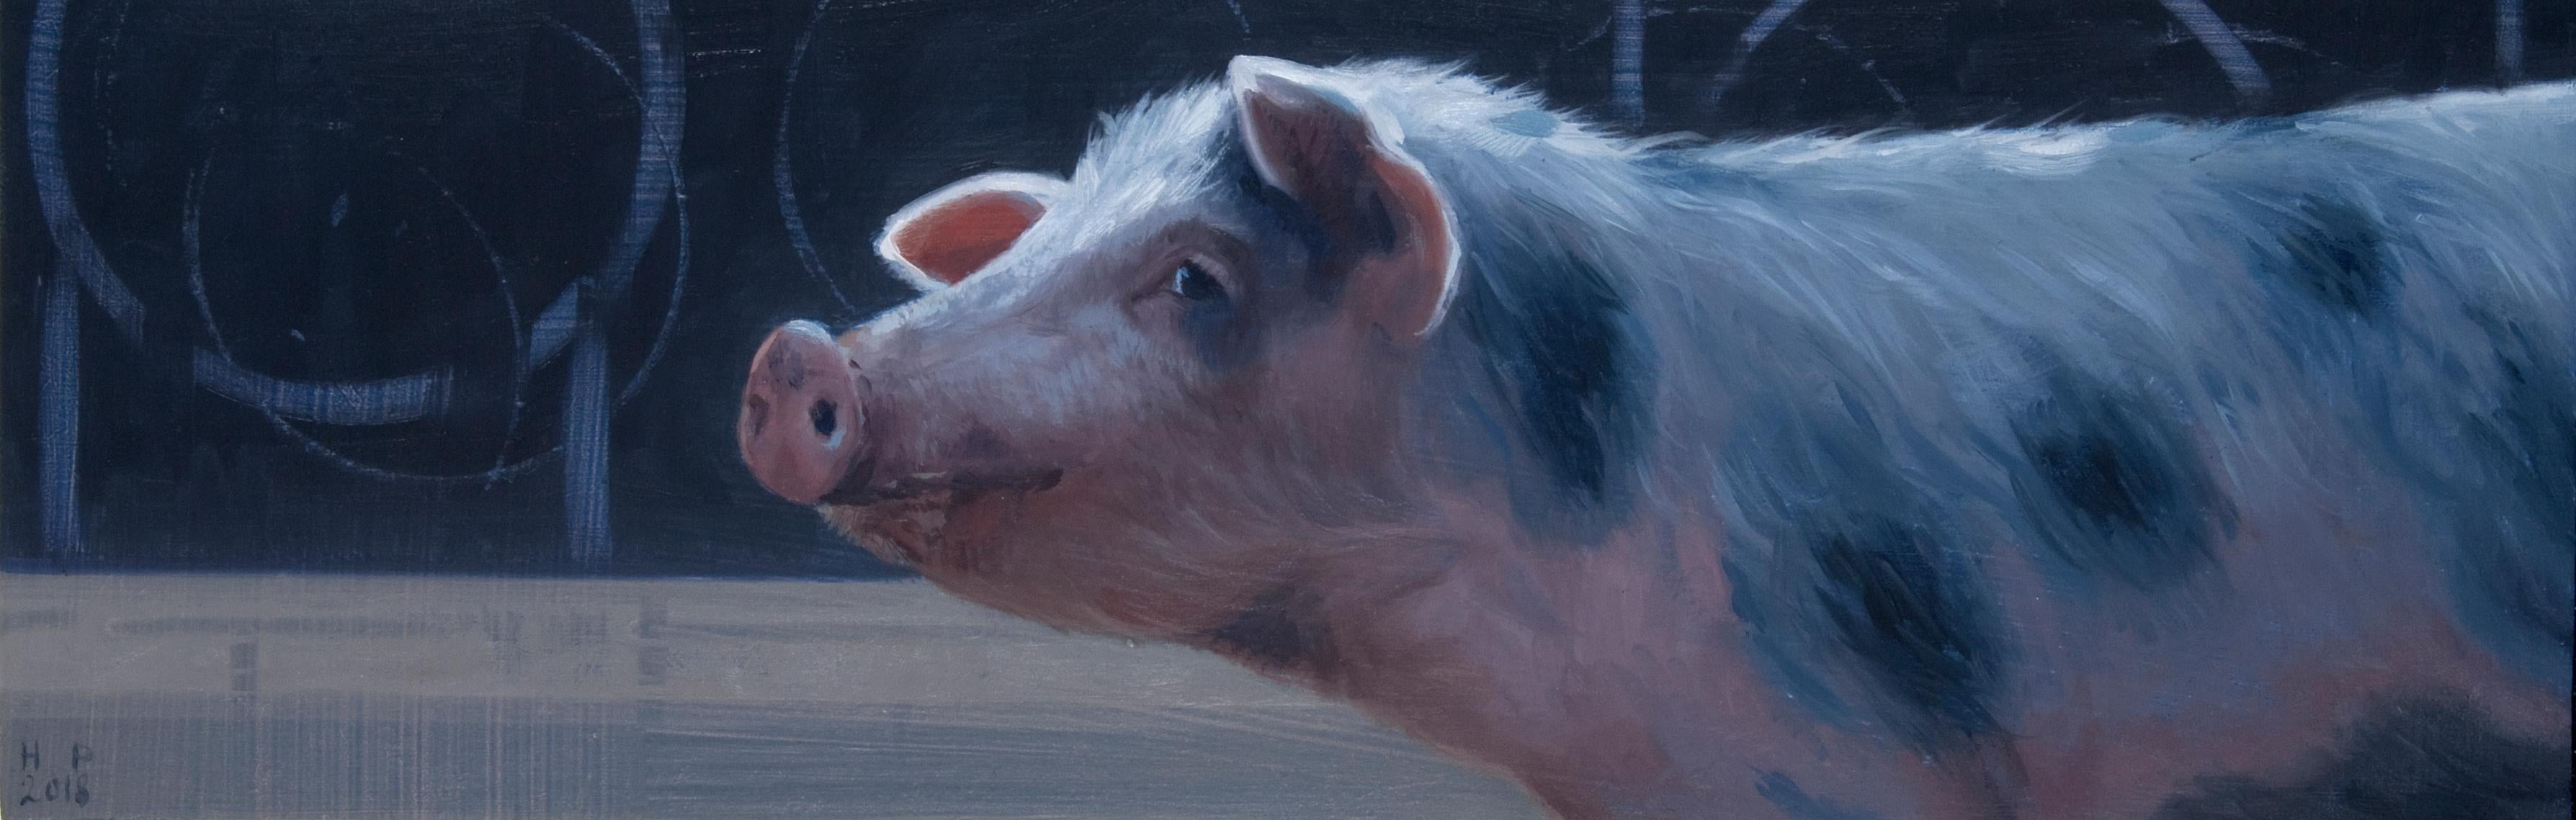 Piggy- 21 st Century Contemporary Painting of a Pig